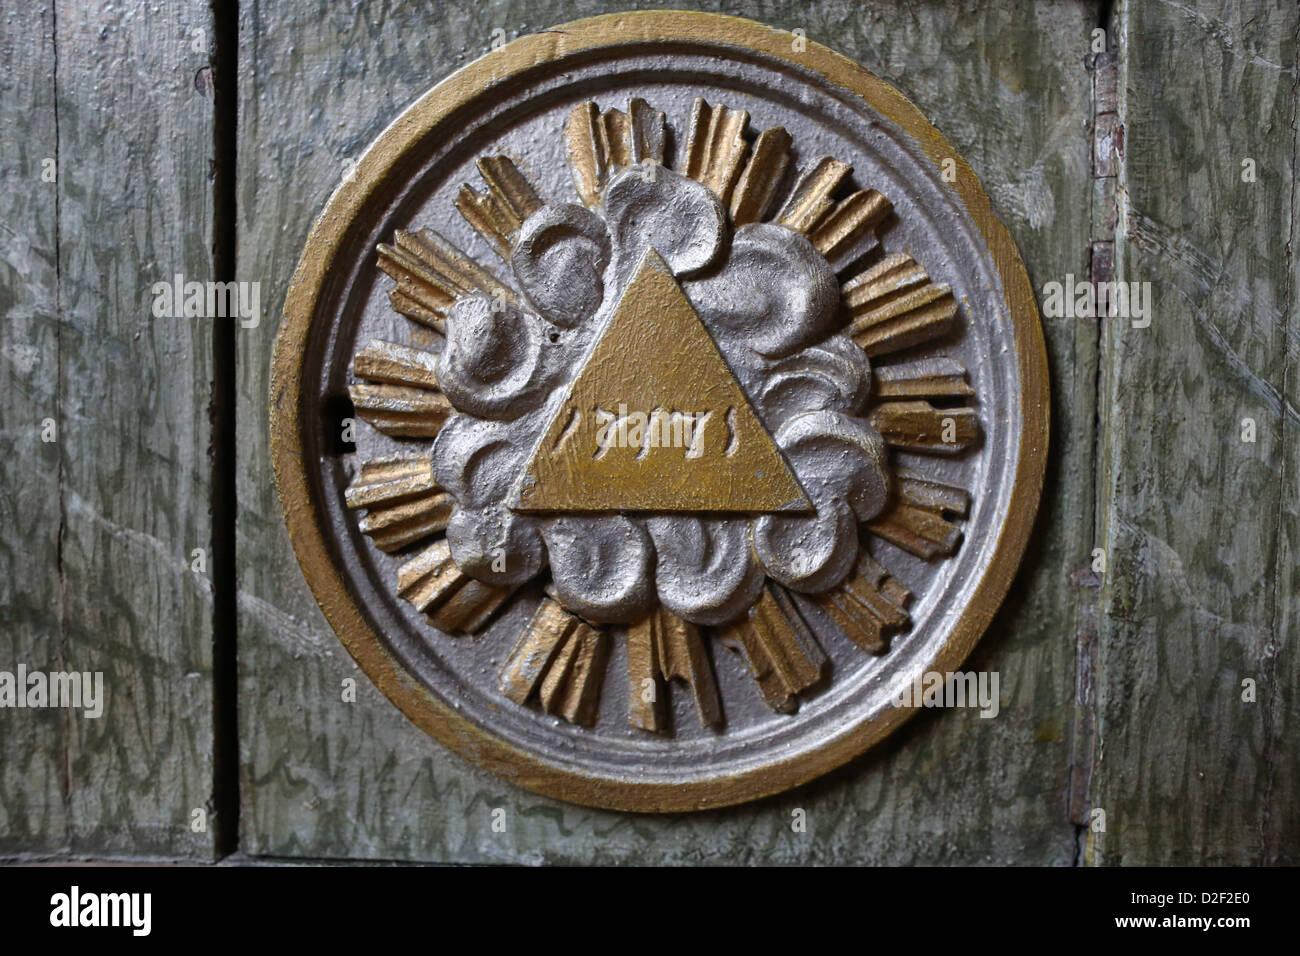 The tetragrammation. Paris. France. - Stock Image